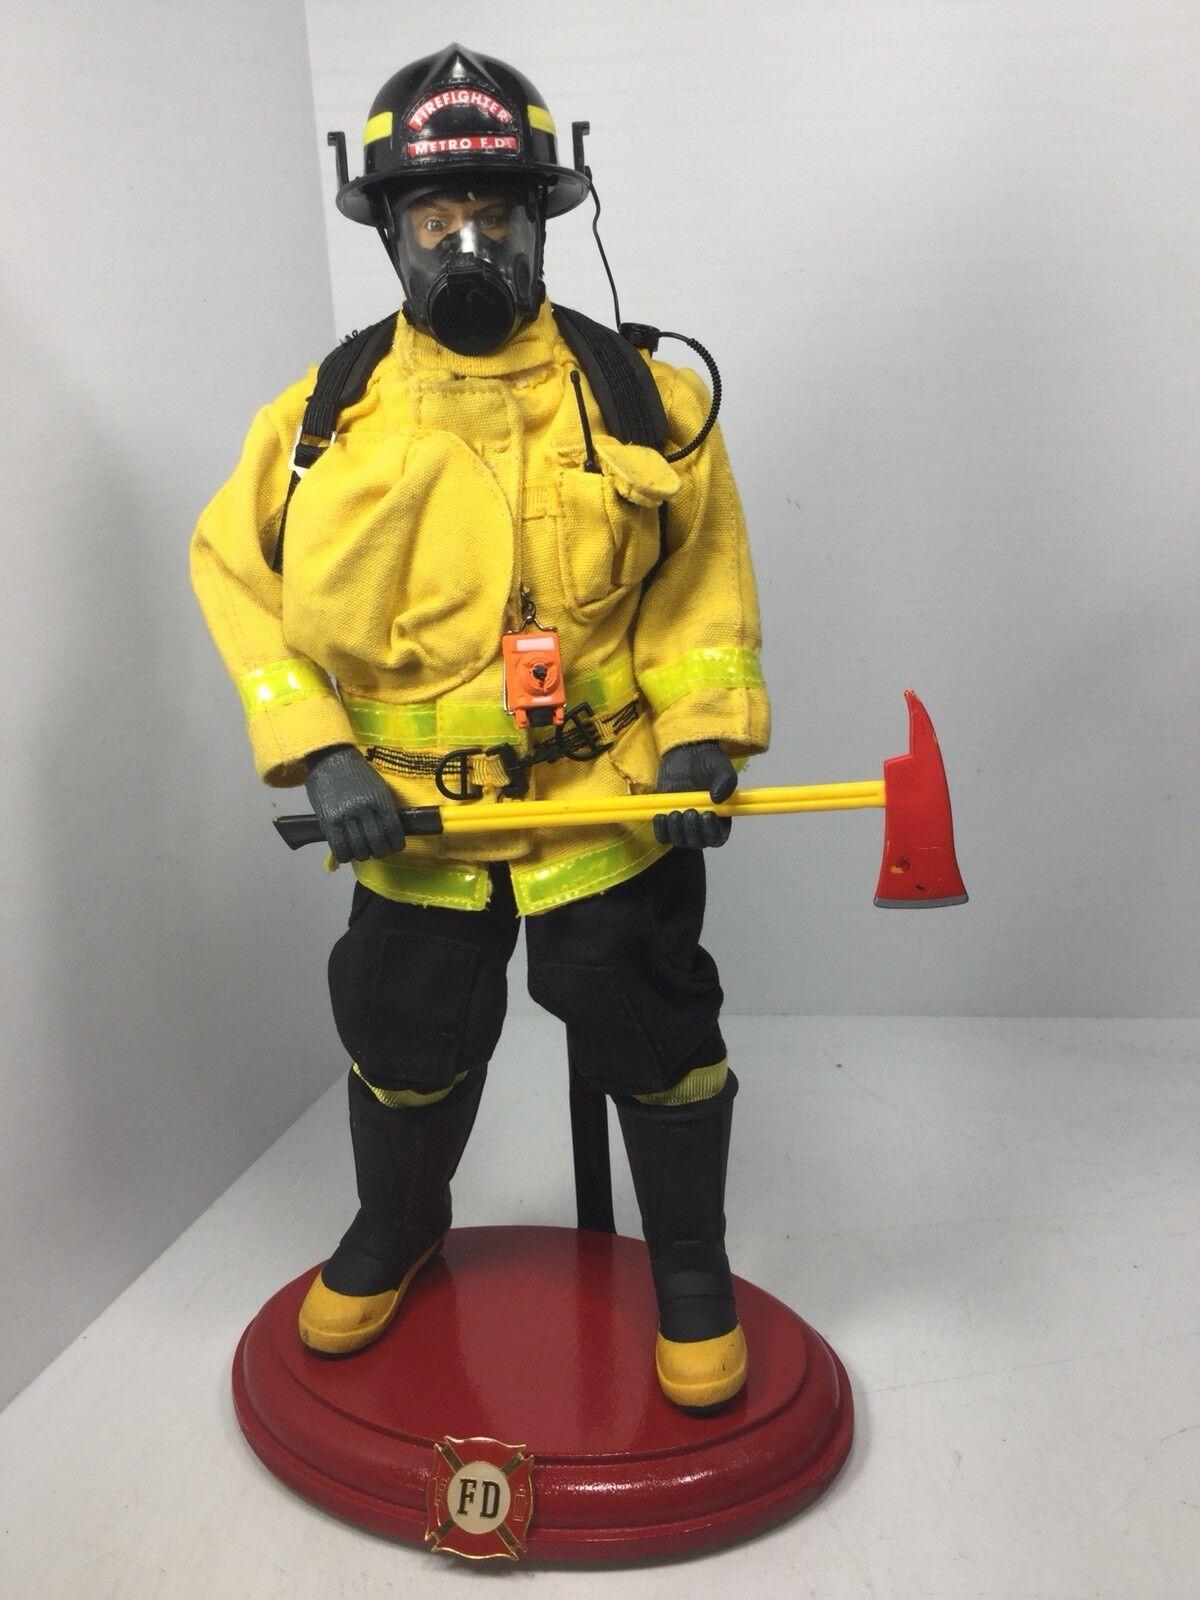 16 21ST CENTURY US FIREuomo FIREFIGHTER STe AXE 911 NYFD DRAGON DID BBI 21